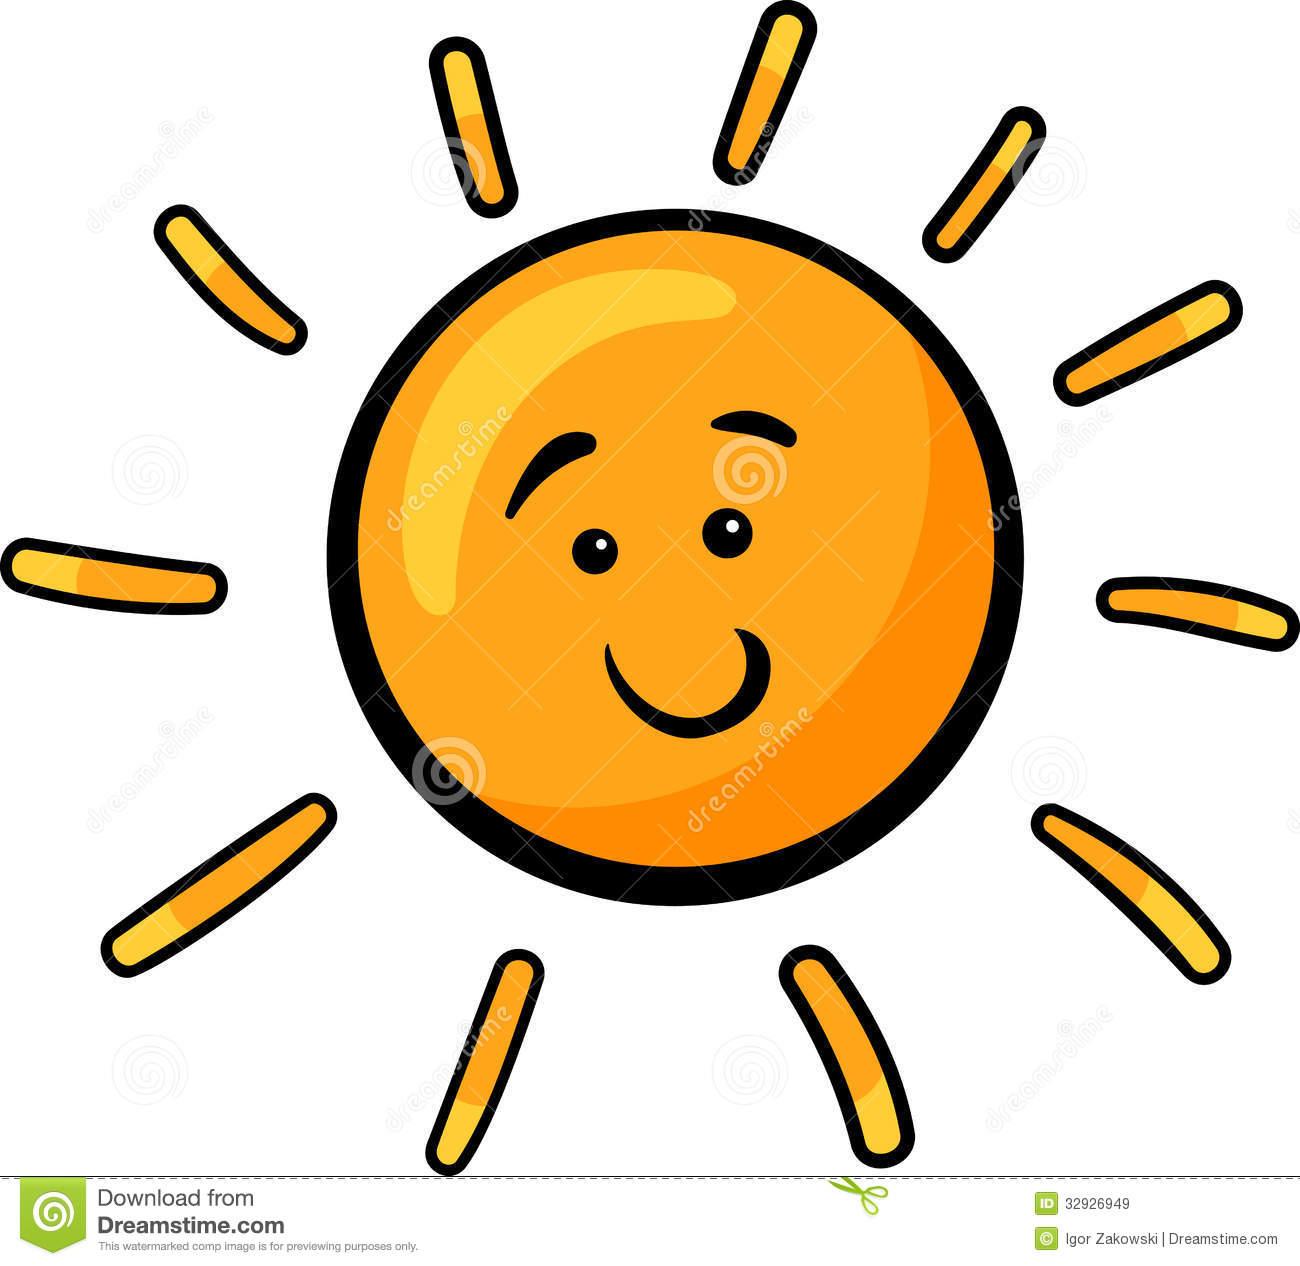 Sunshine With Sunglasses Clipart Cute sun with sunglasses